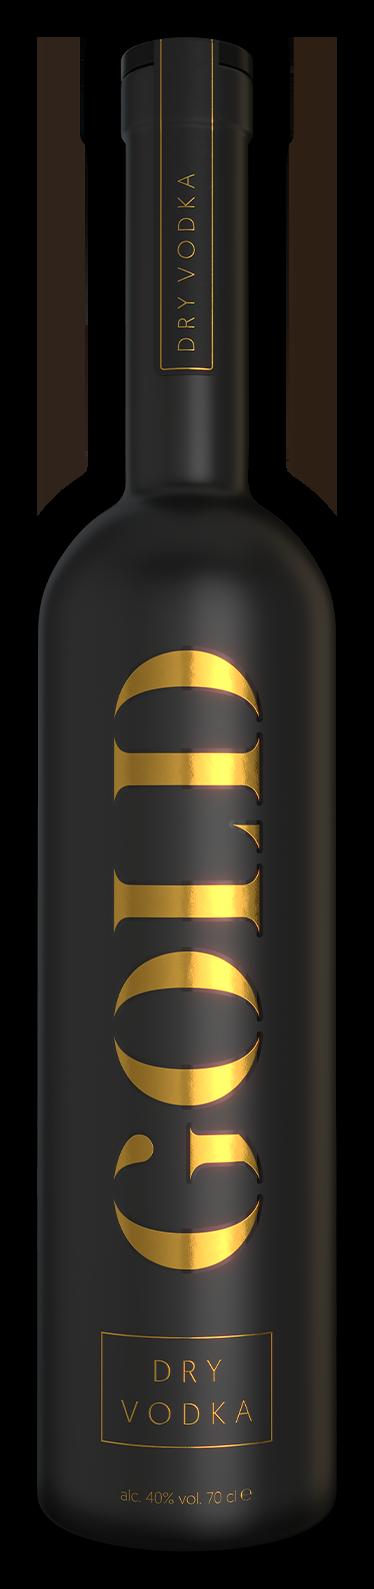 Gold Dry VODKA 0.7ltr by Joel Beukers-1